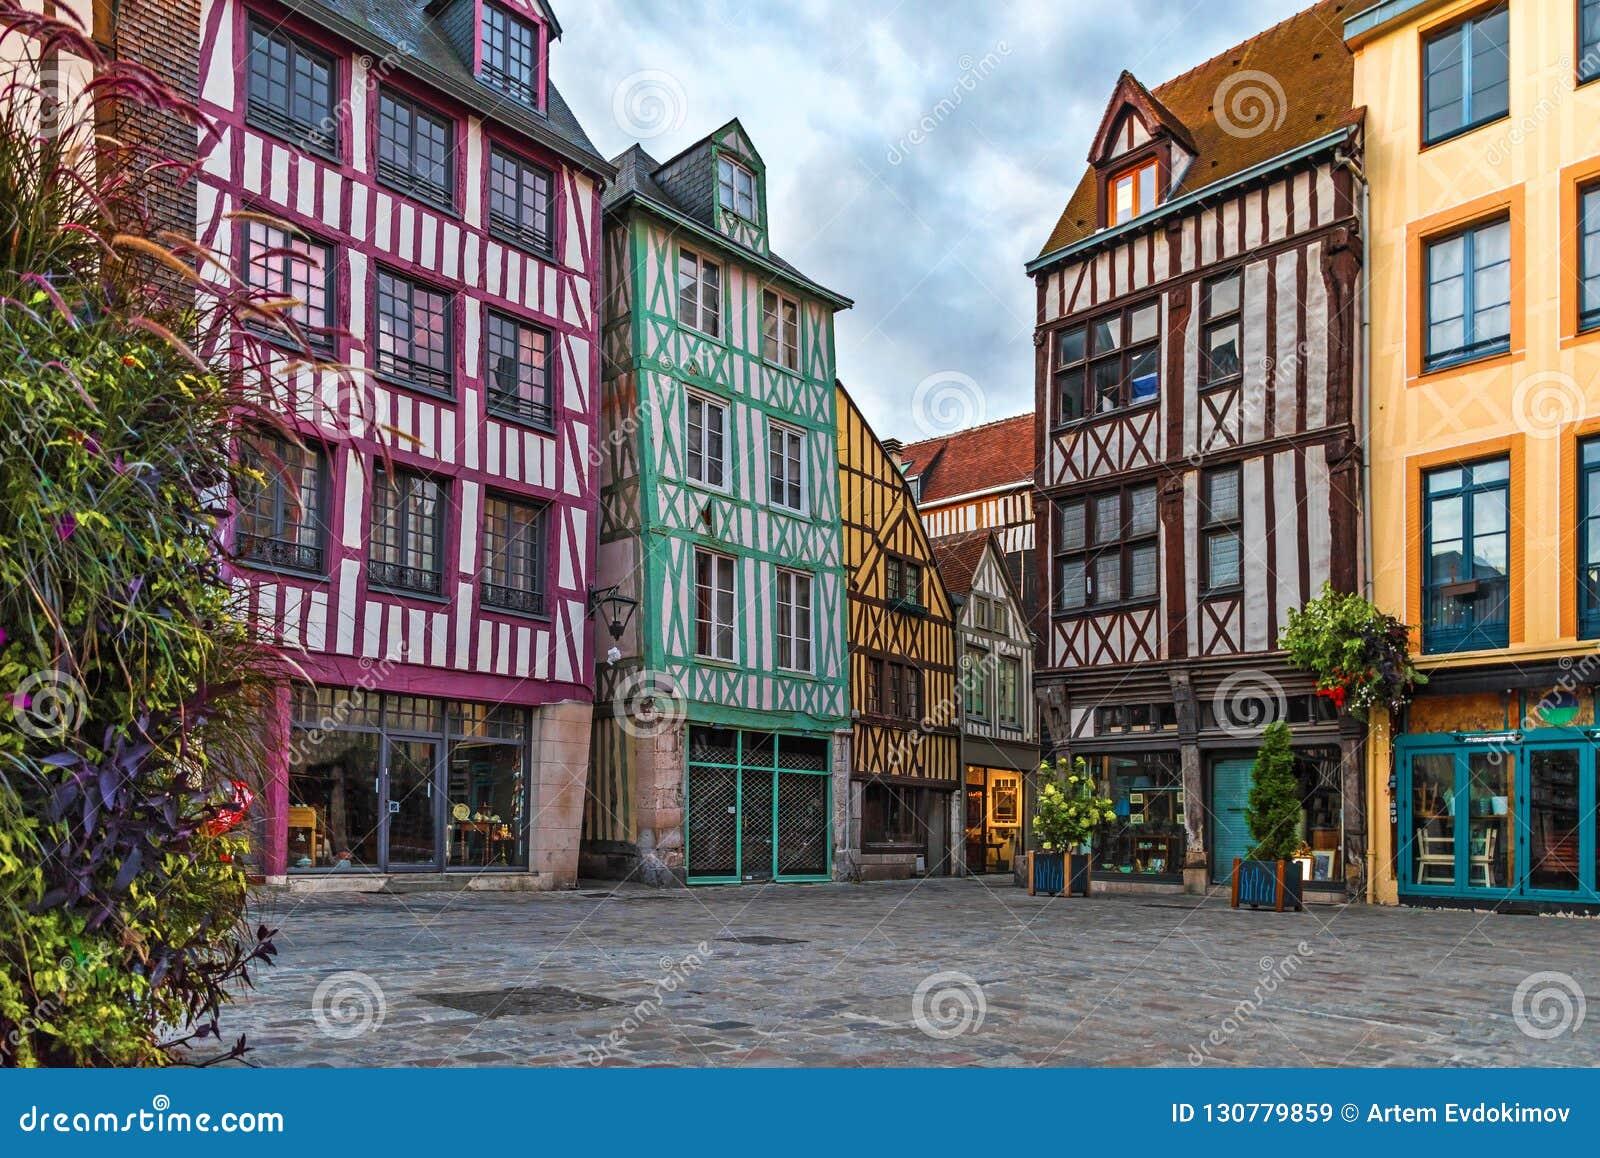 Medeltida fyrkant med typiska hus i gammal stad av Rouen, Normandie, Frankrike